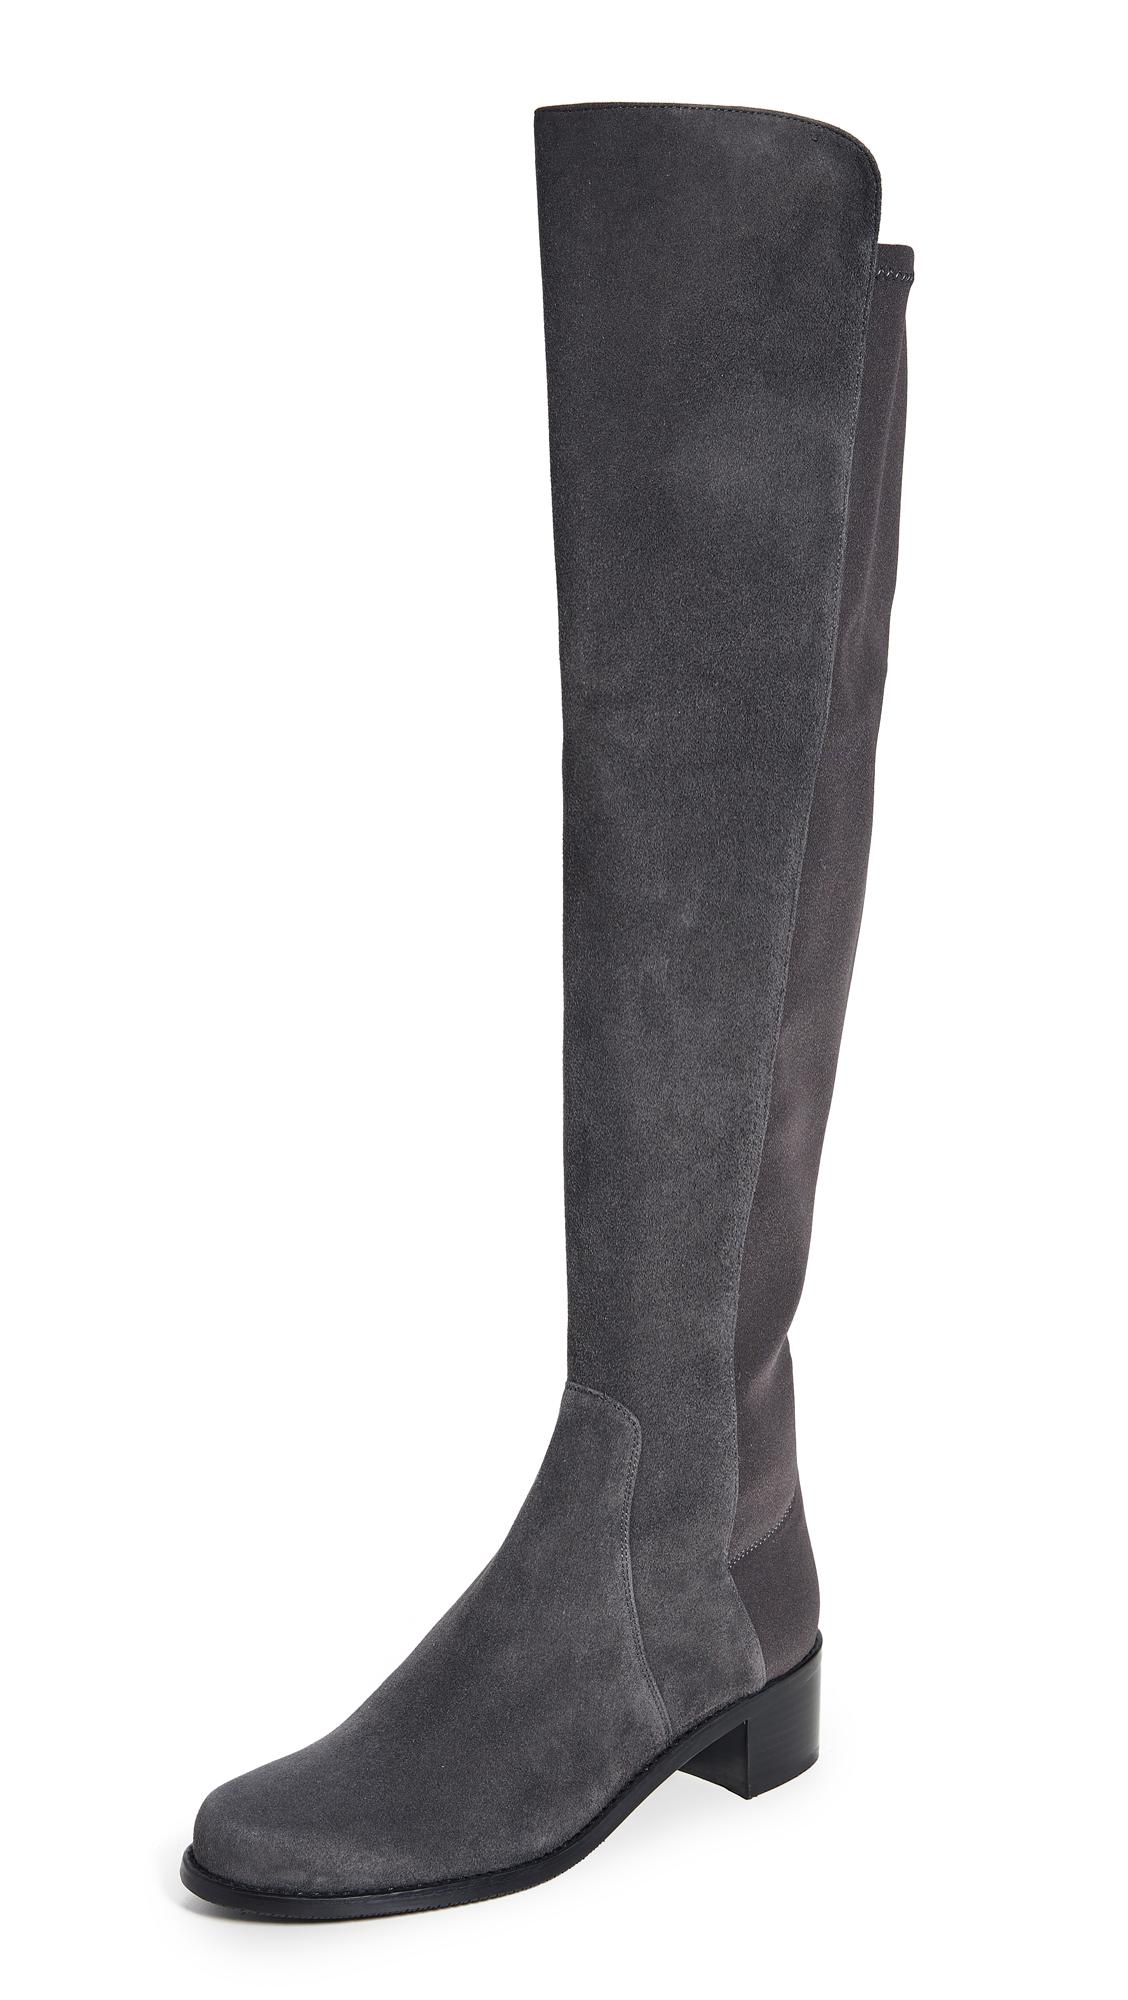 Stuart Weitzman Reserve Stretch Suede Boots - Slate